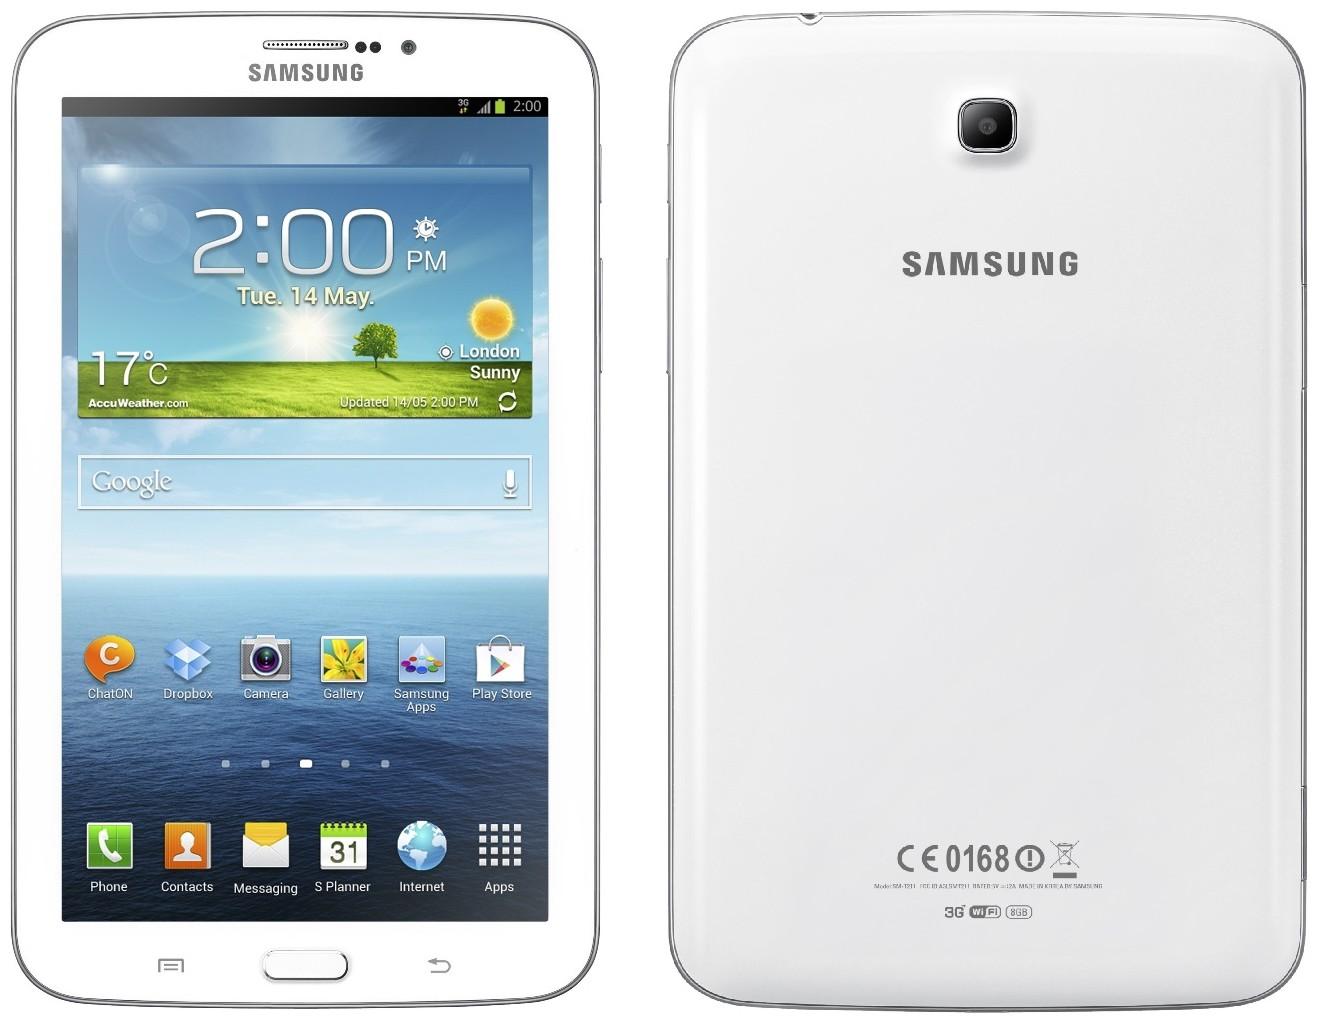 Samsung Galaxy Tab 3 7.0 3G SM-T211 16GB vs. Plum Z711 3G - Phonegg